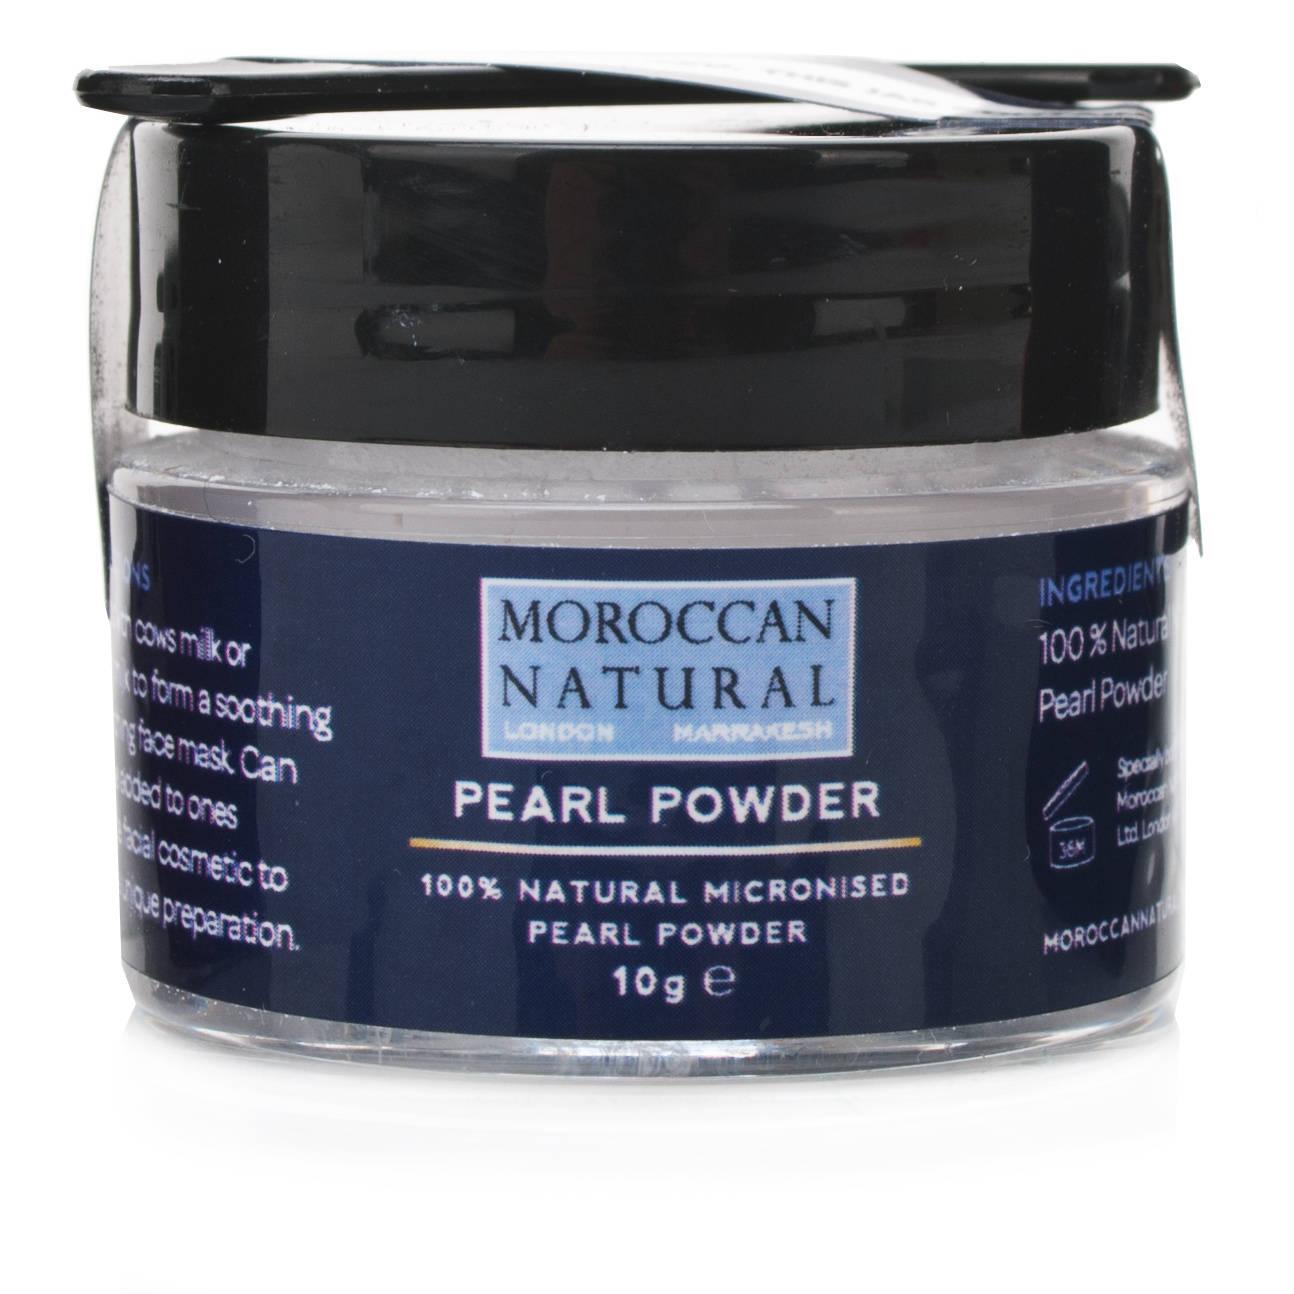 Moroccan-Natural-Pure-Pearl-Powder-1